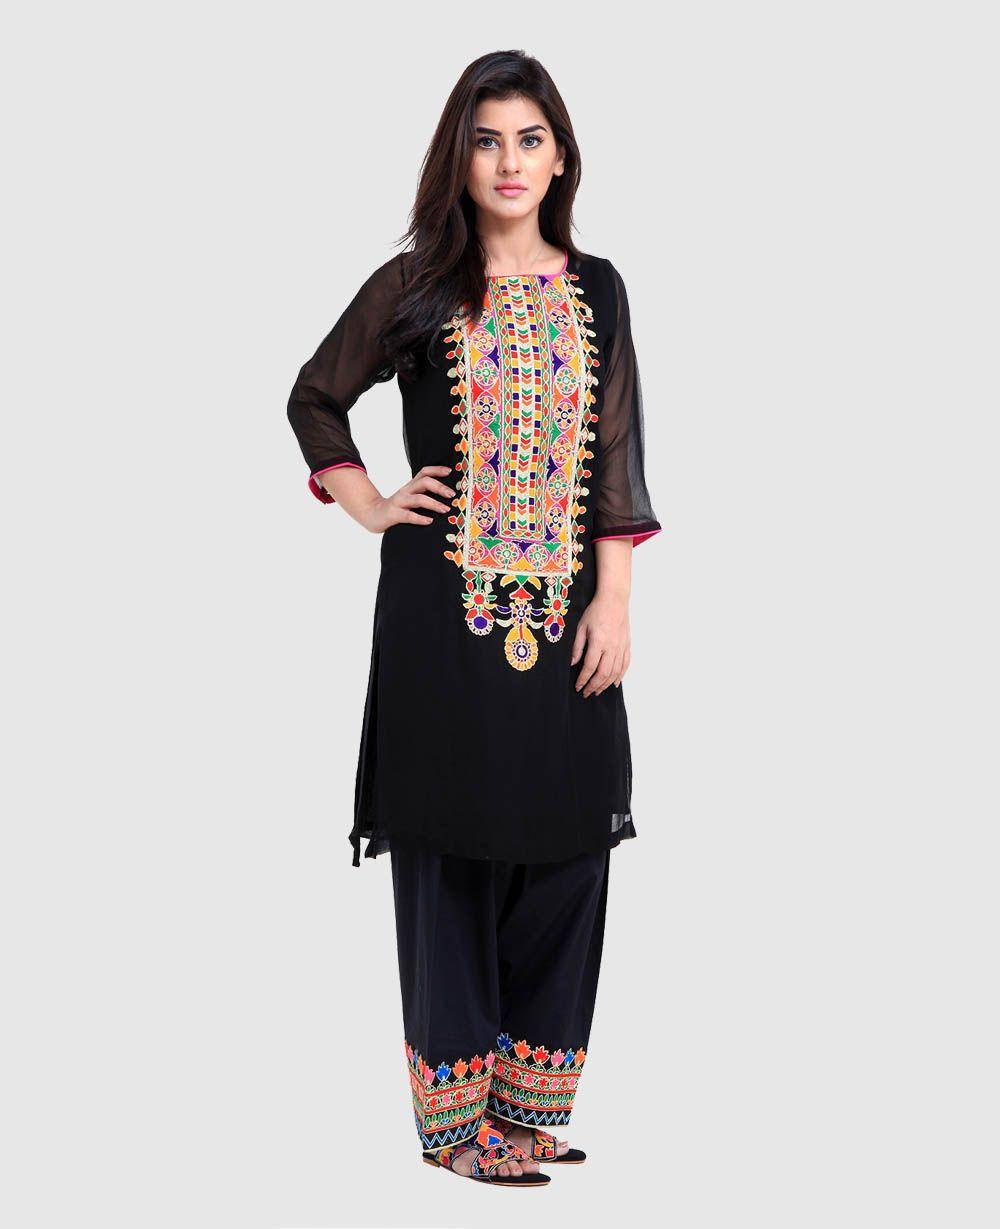 39806a2b77 Rang Ja Embroidered Kurtas with Tulip Pants- Eid Collection 2016-2017 (18)